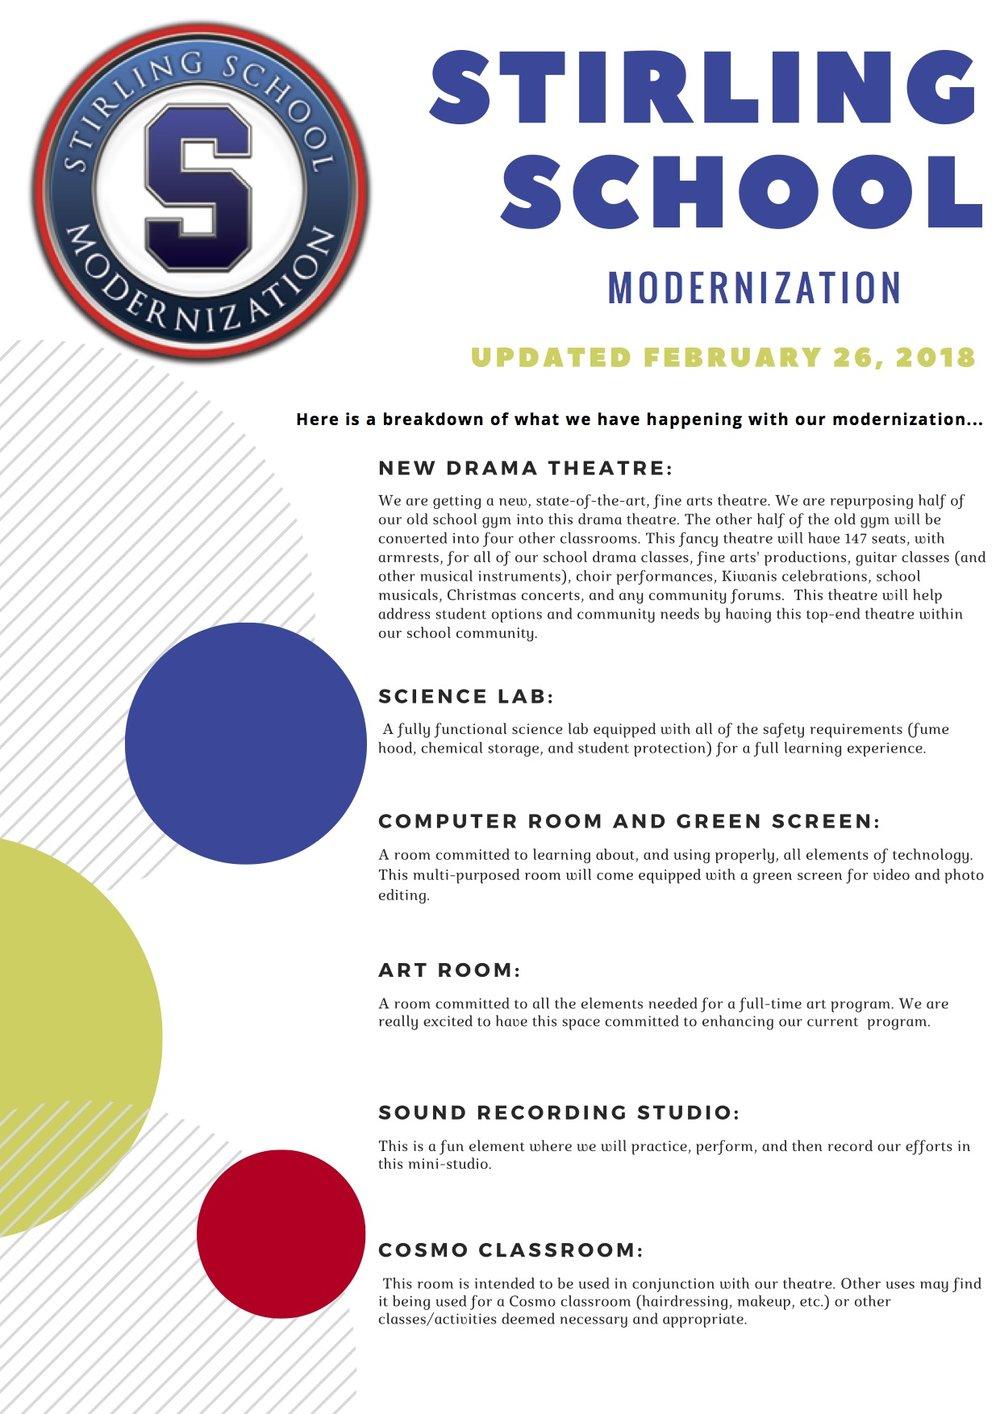 modernization-1.jpg